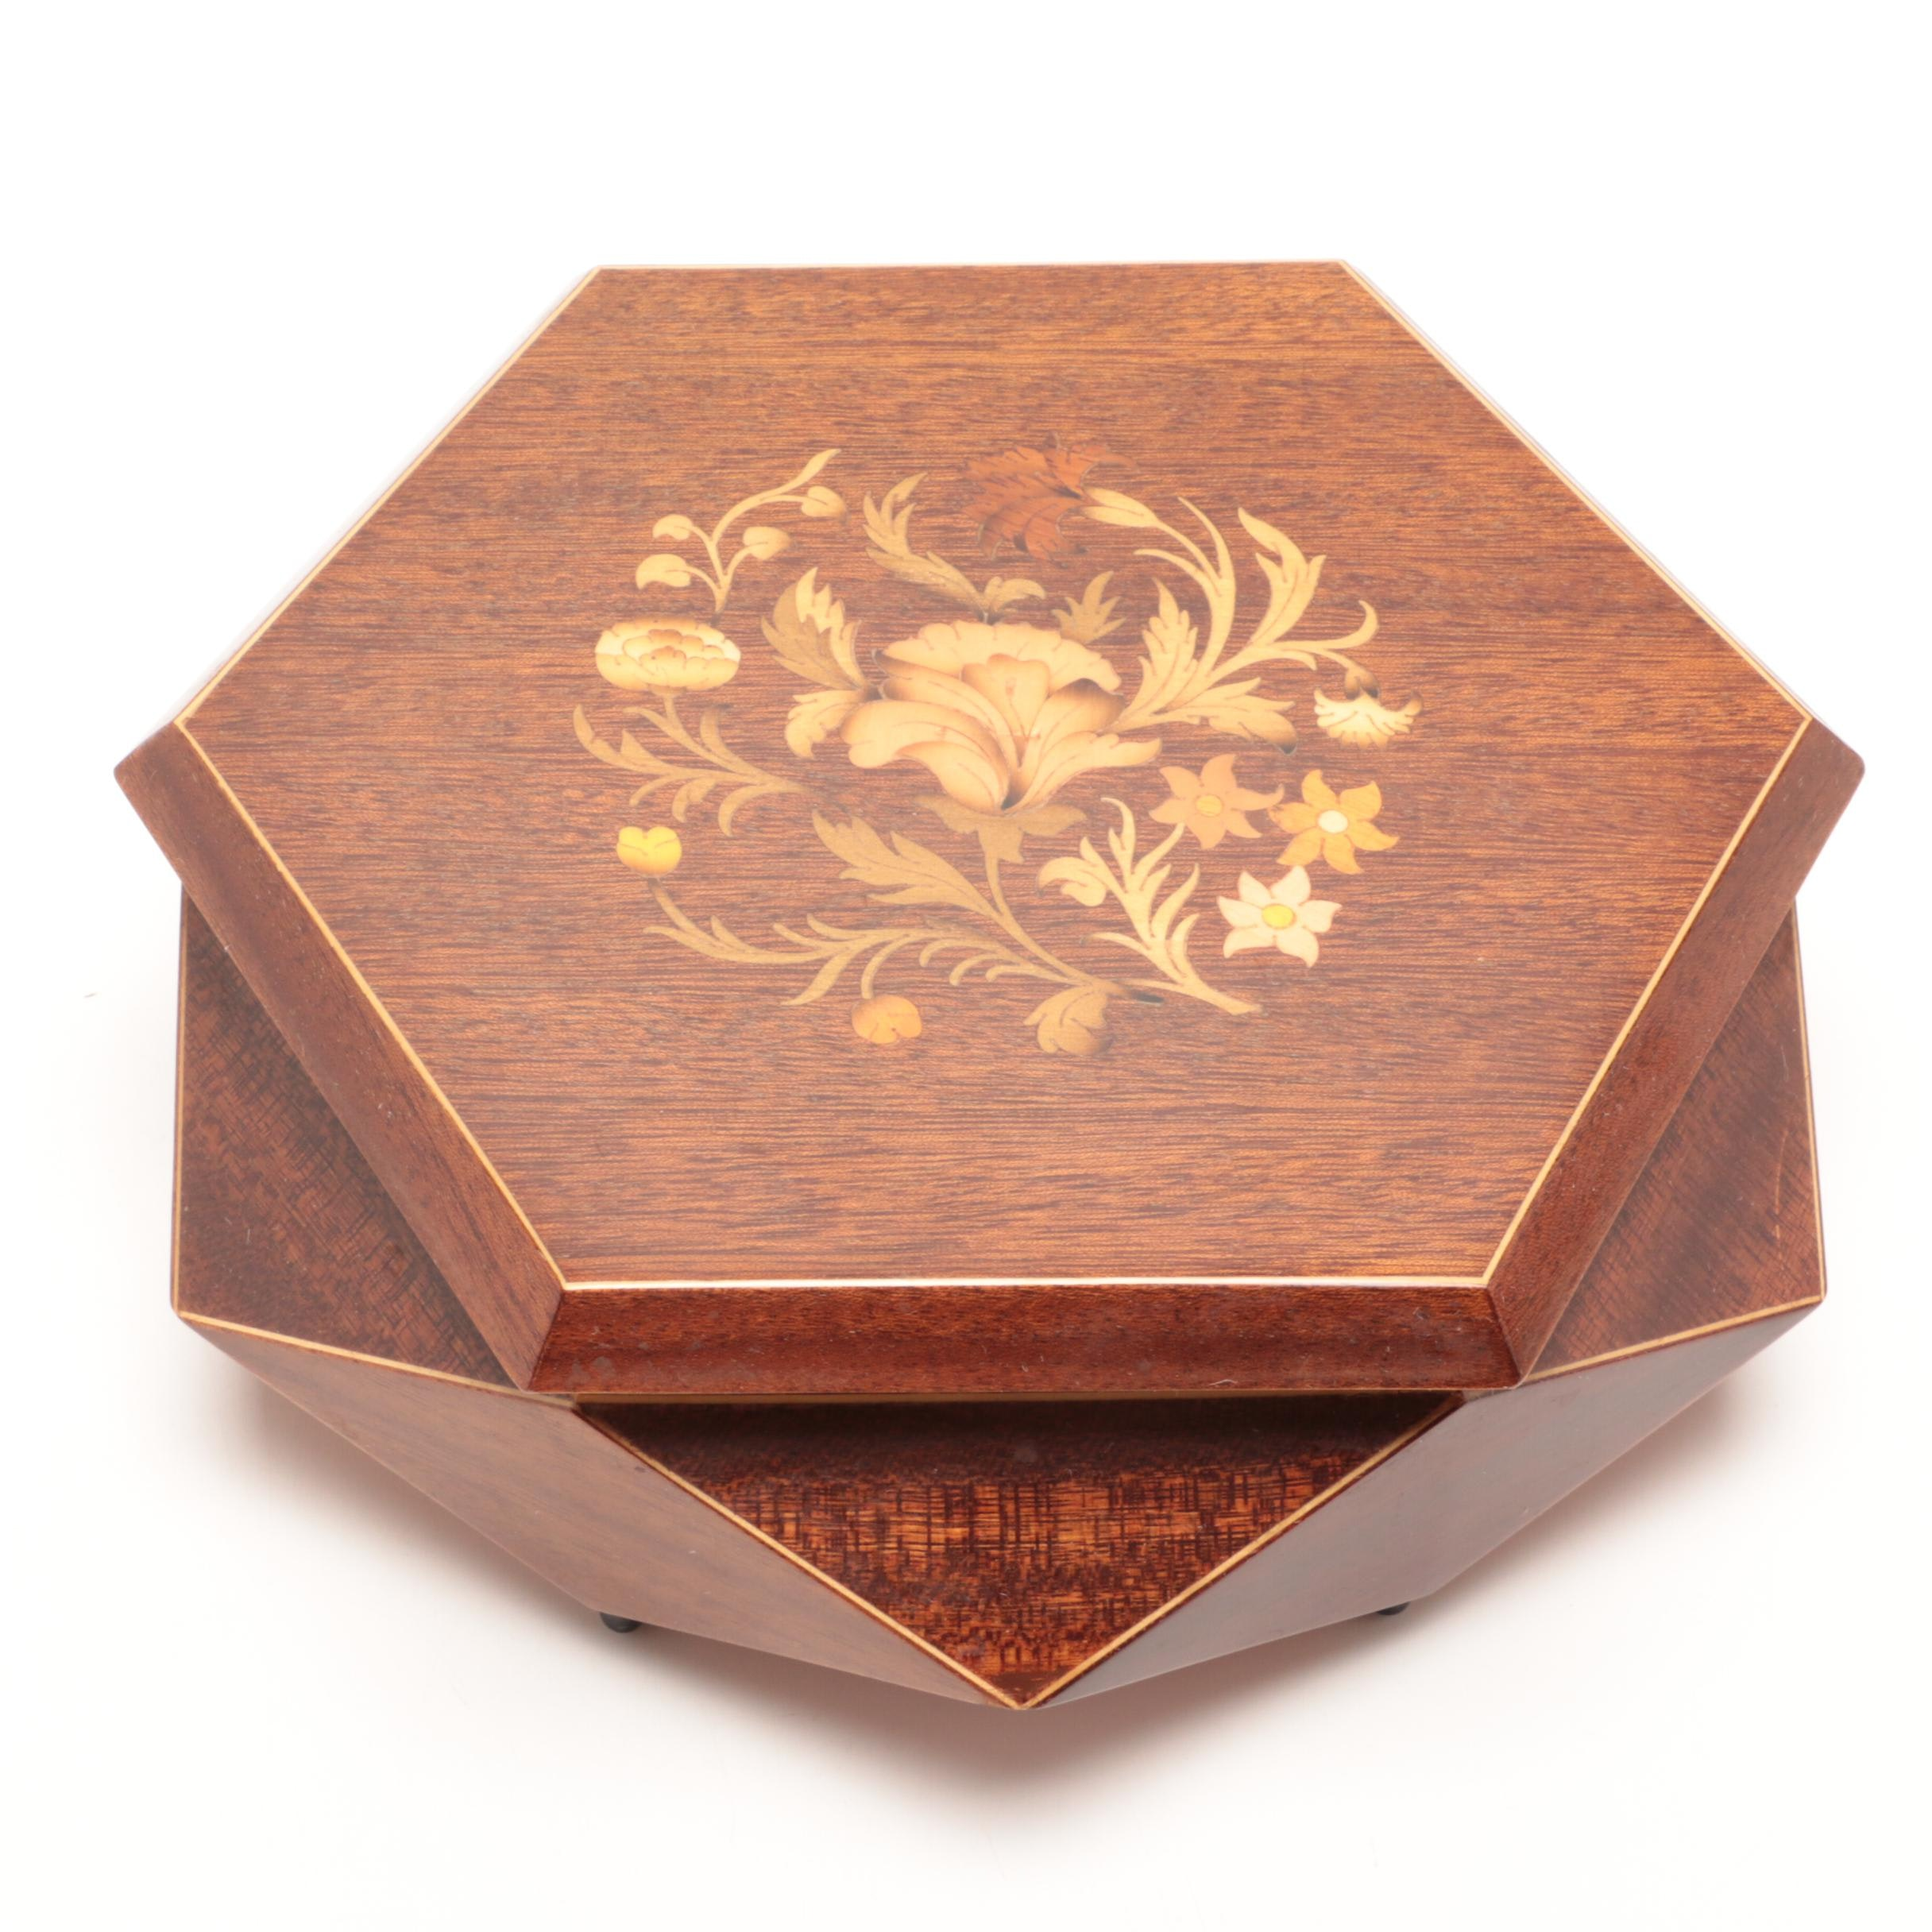 Marquetry Music Jewelry Box With Mahogany Finish